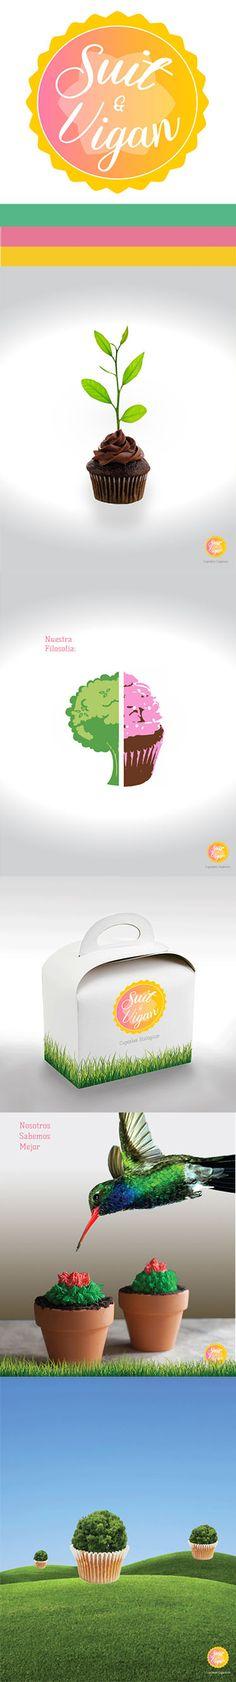 Proyecto de dirección de arte. Cupcakes orgánicos